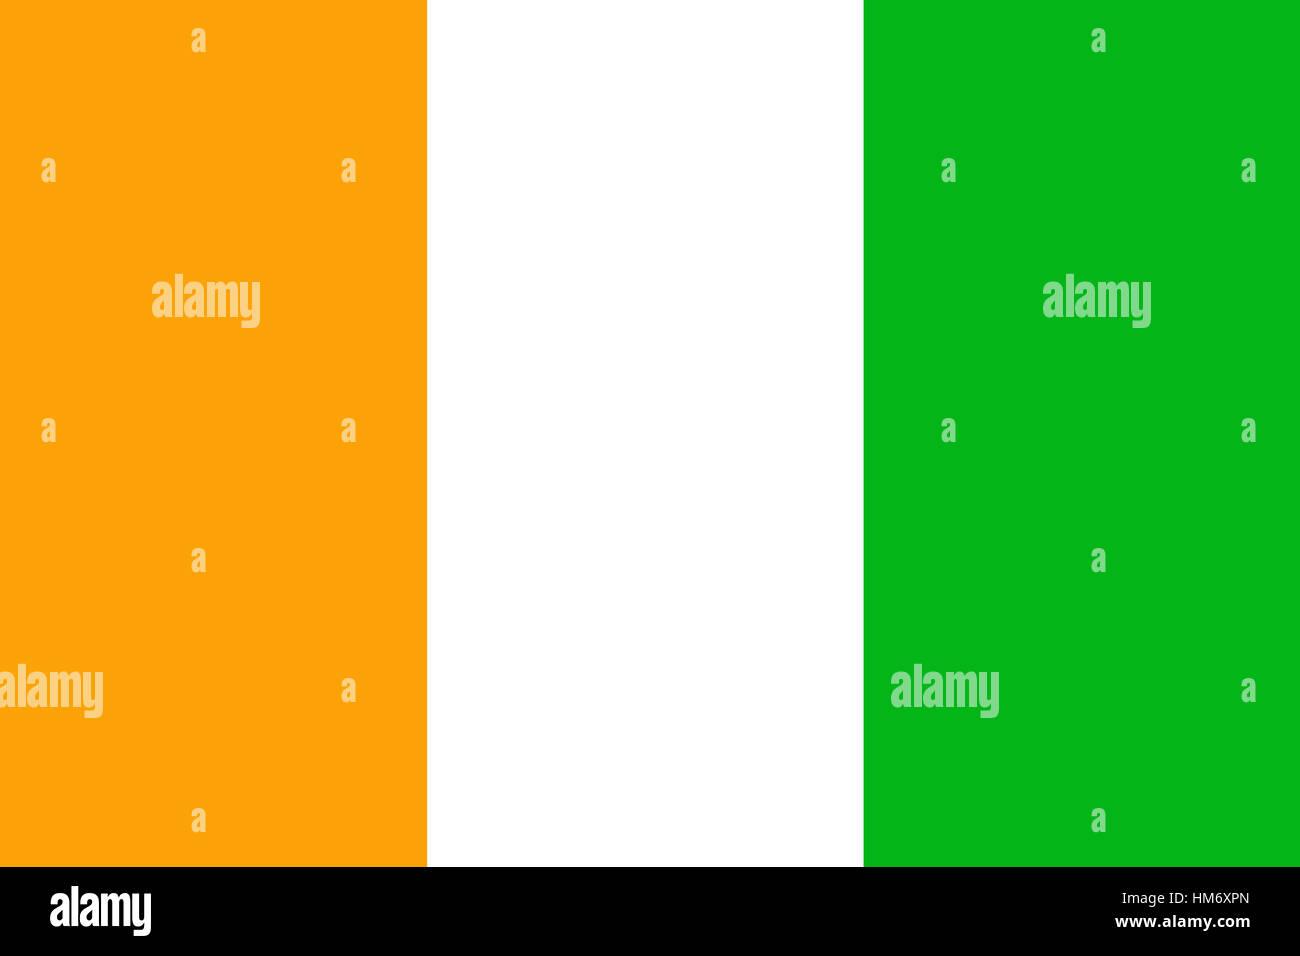 Cote d'ivoire flag 3D illustration symbol. ,Original and simple Ivory Coast flag.Nation flag - Stock Image